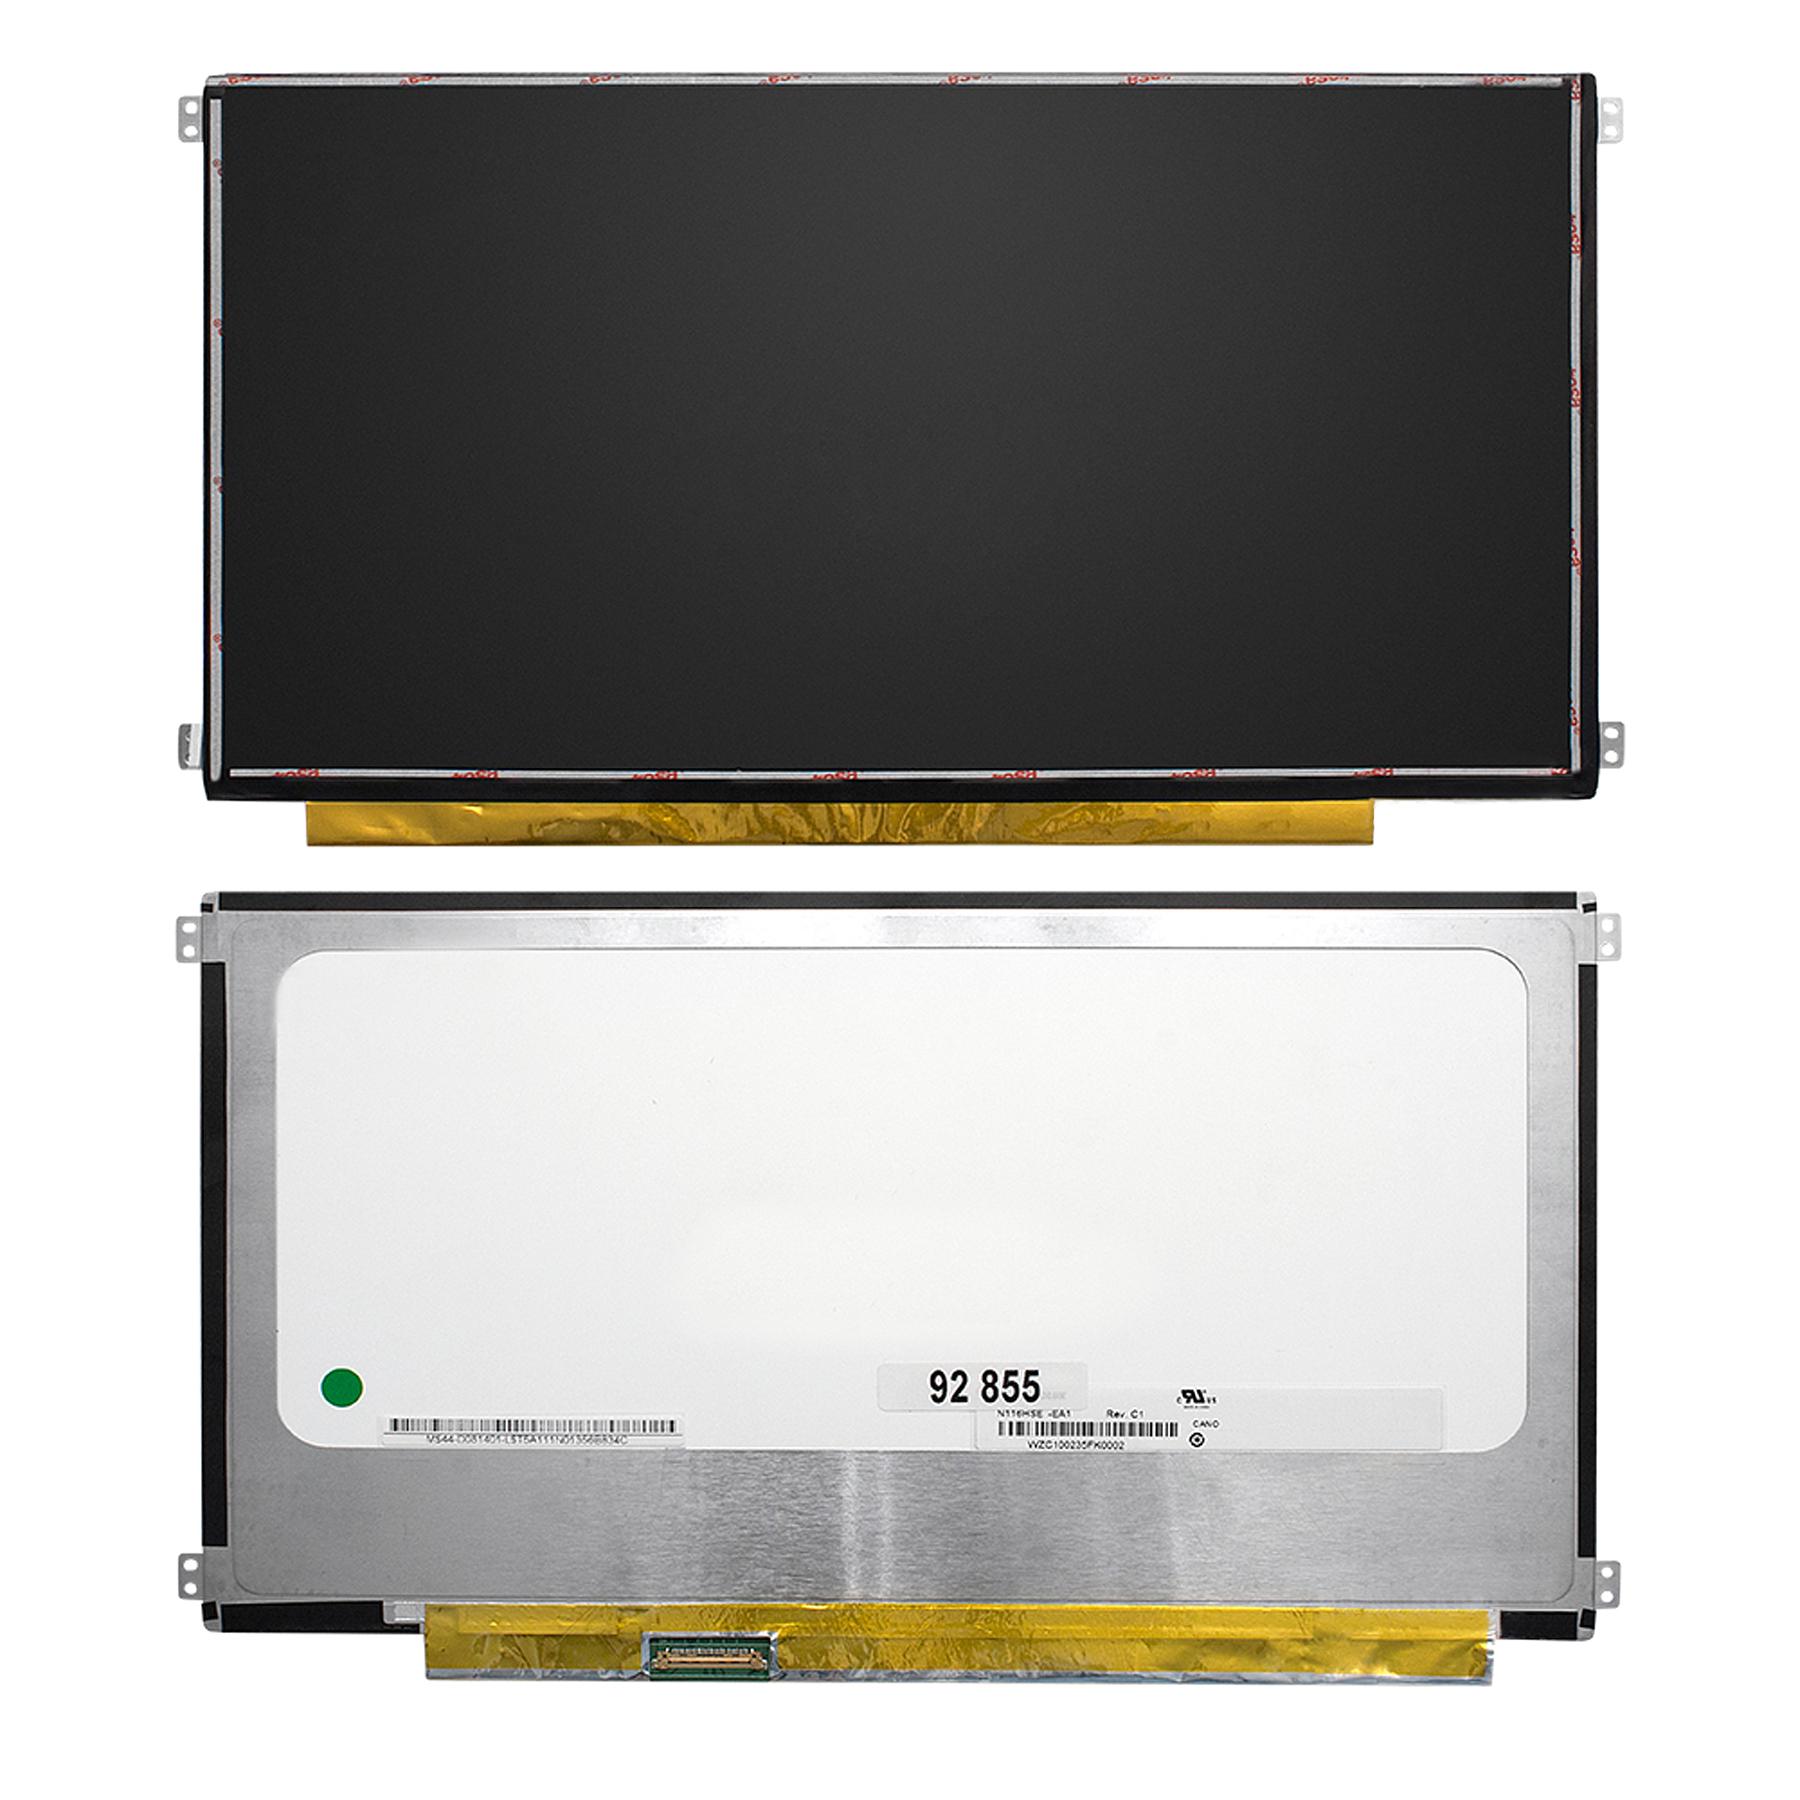 Запчасти для ремонта теле, видео, аудио 11.6 1920x1080 FHD 30 pin Slim IPS крепления слева/справа (уши). Матовая. PN: N116HSE-EA1.